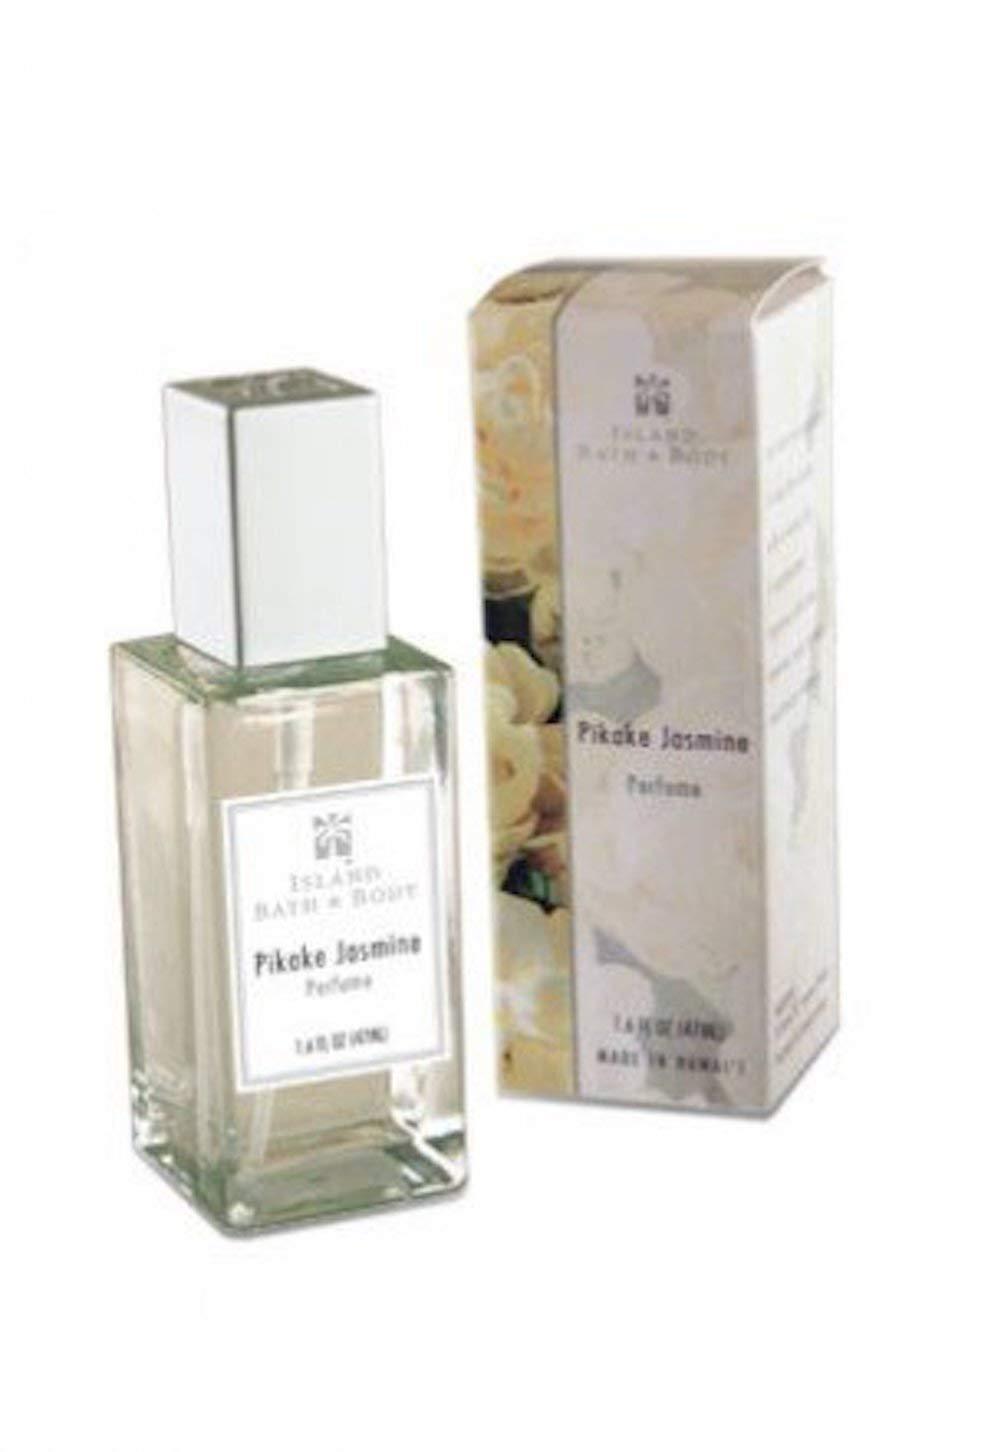 Island Bath & Body Pikake Jasmine Perfume 1.6oz.